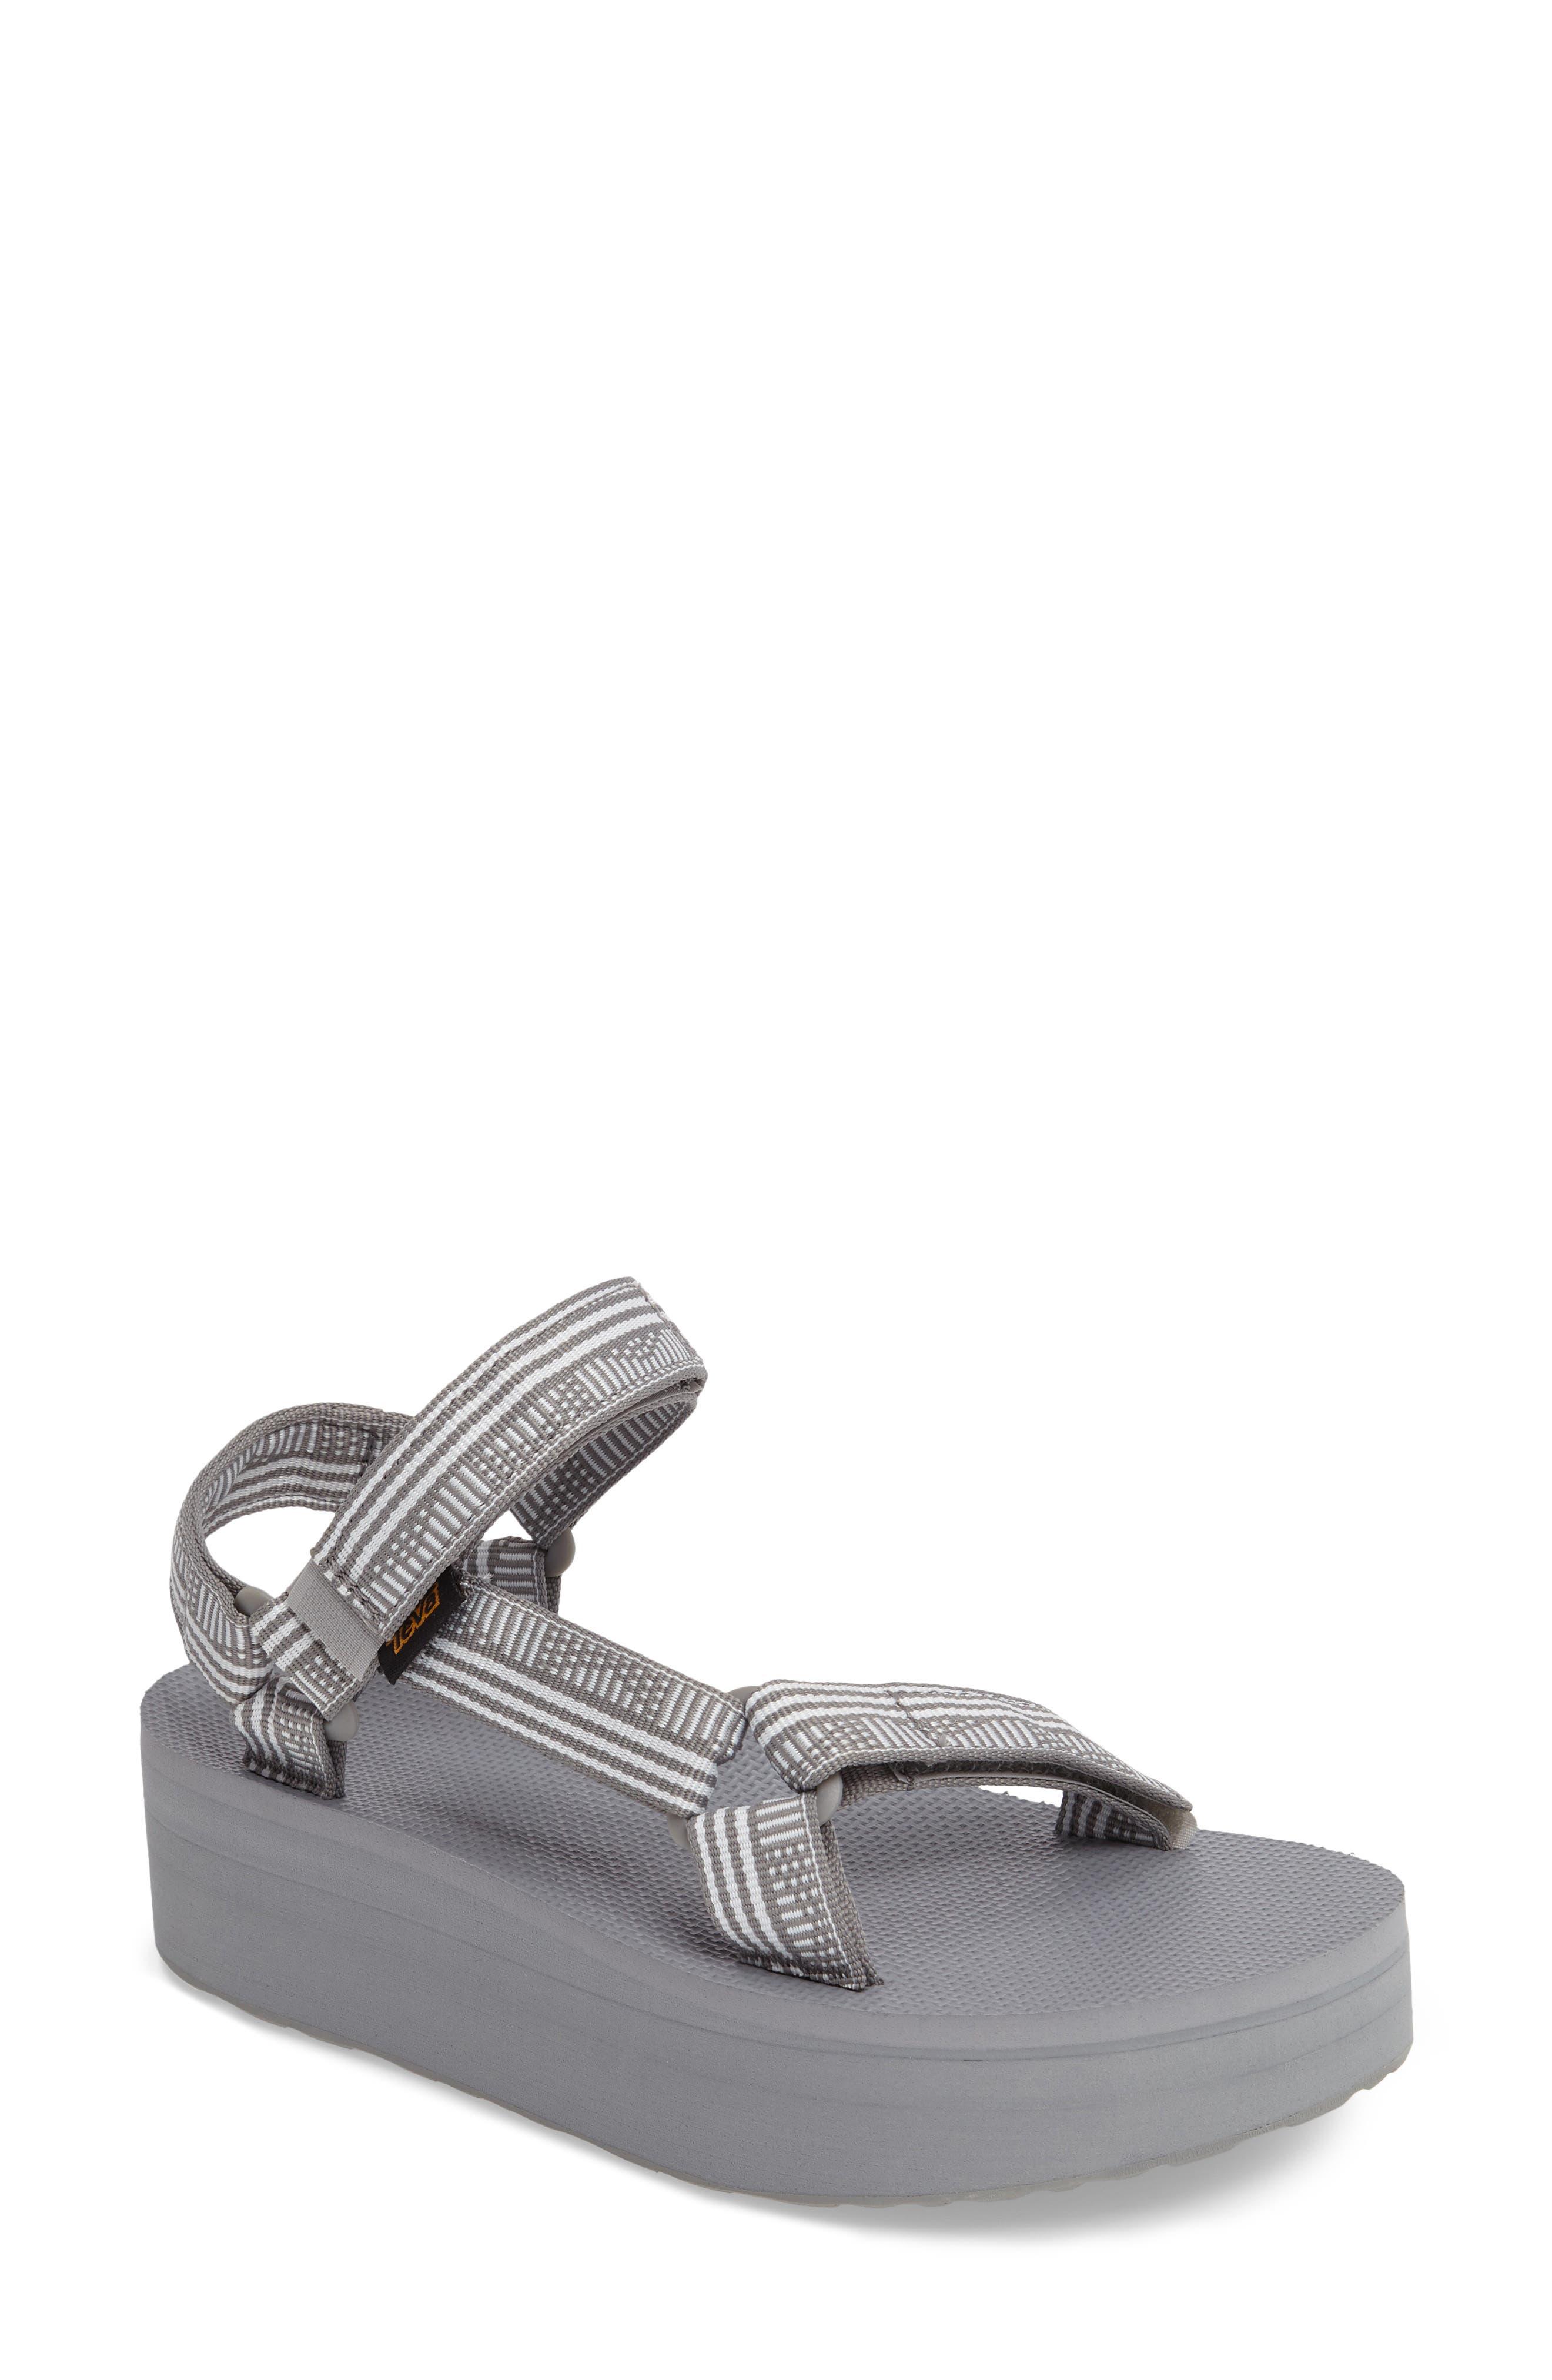 Alternate Image 1 Selected - Teva 'Universal' Flatform Sandal (Women)